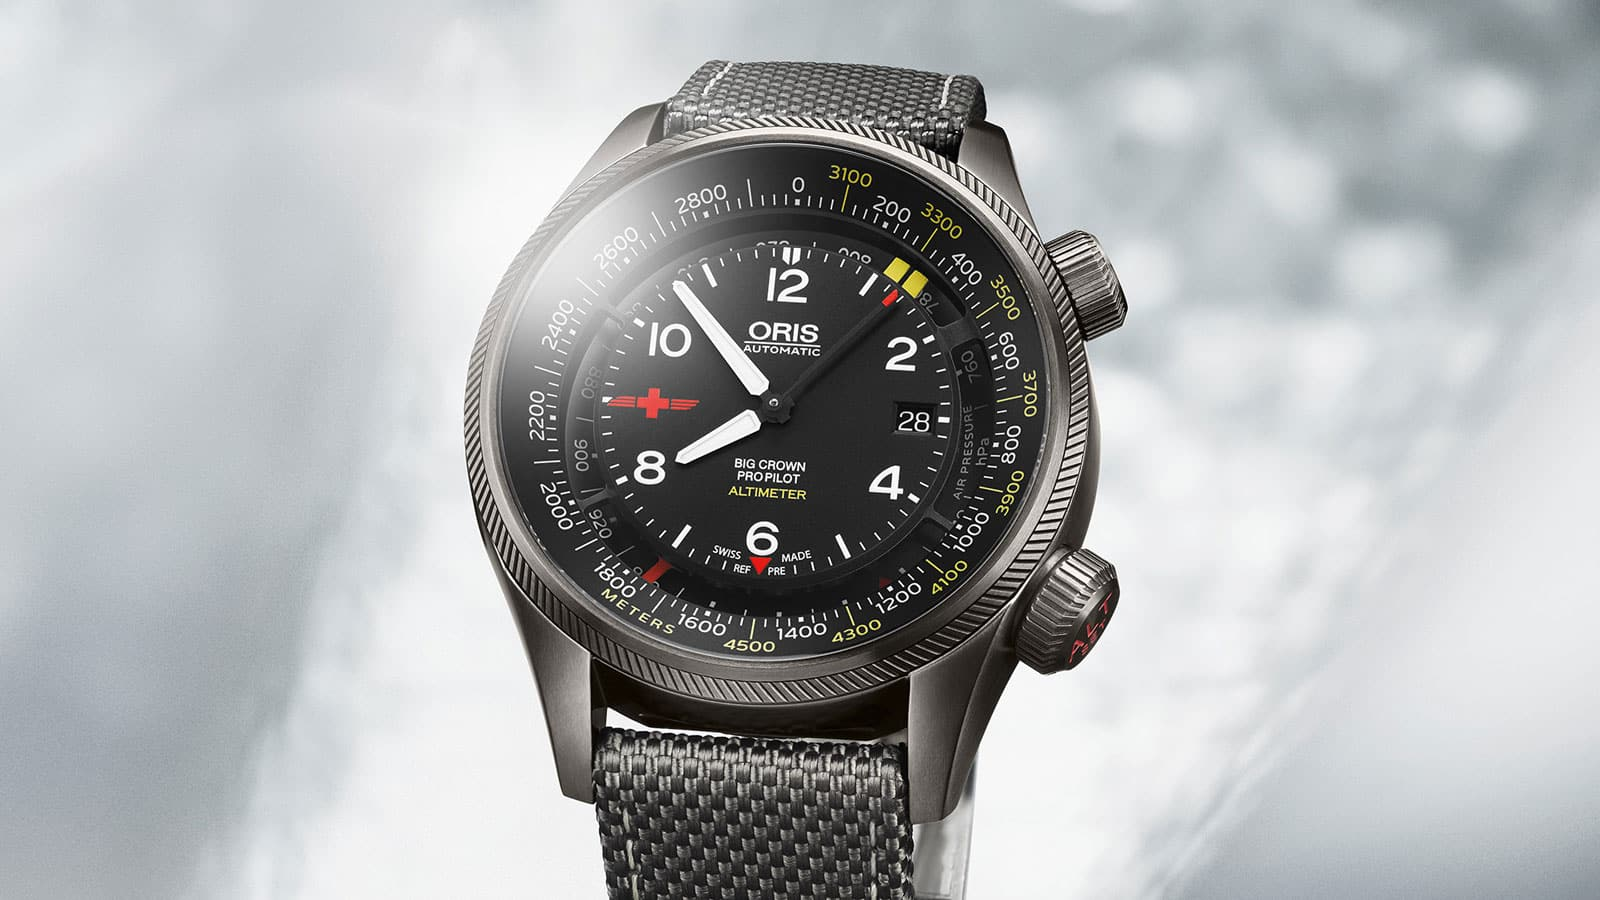 Oris-Montre-Altimeter-Rega-Limited-Edition-01-733-7705-4264-Set5-23-16GFC-Lionel-Meylan-Horlogerie-Joaillerie-Vevey